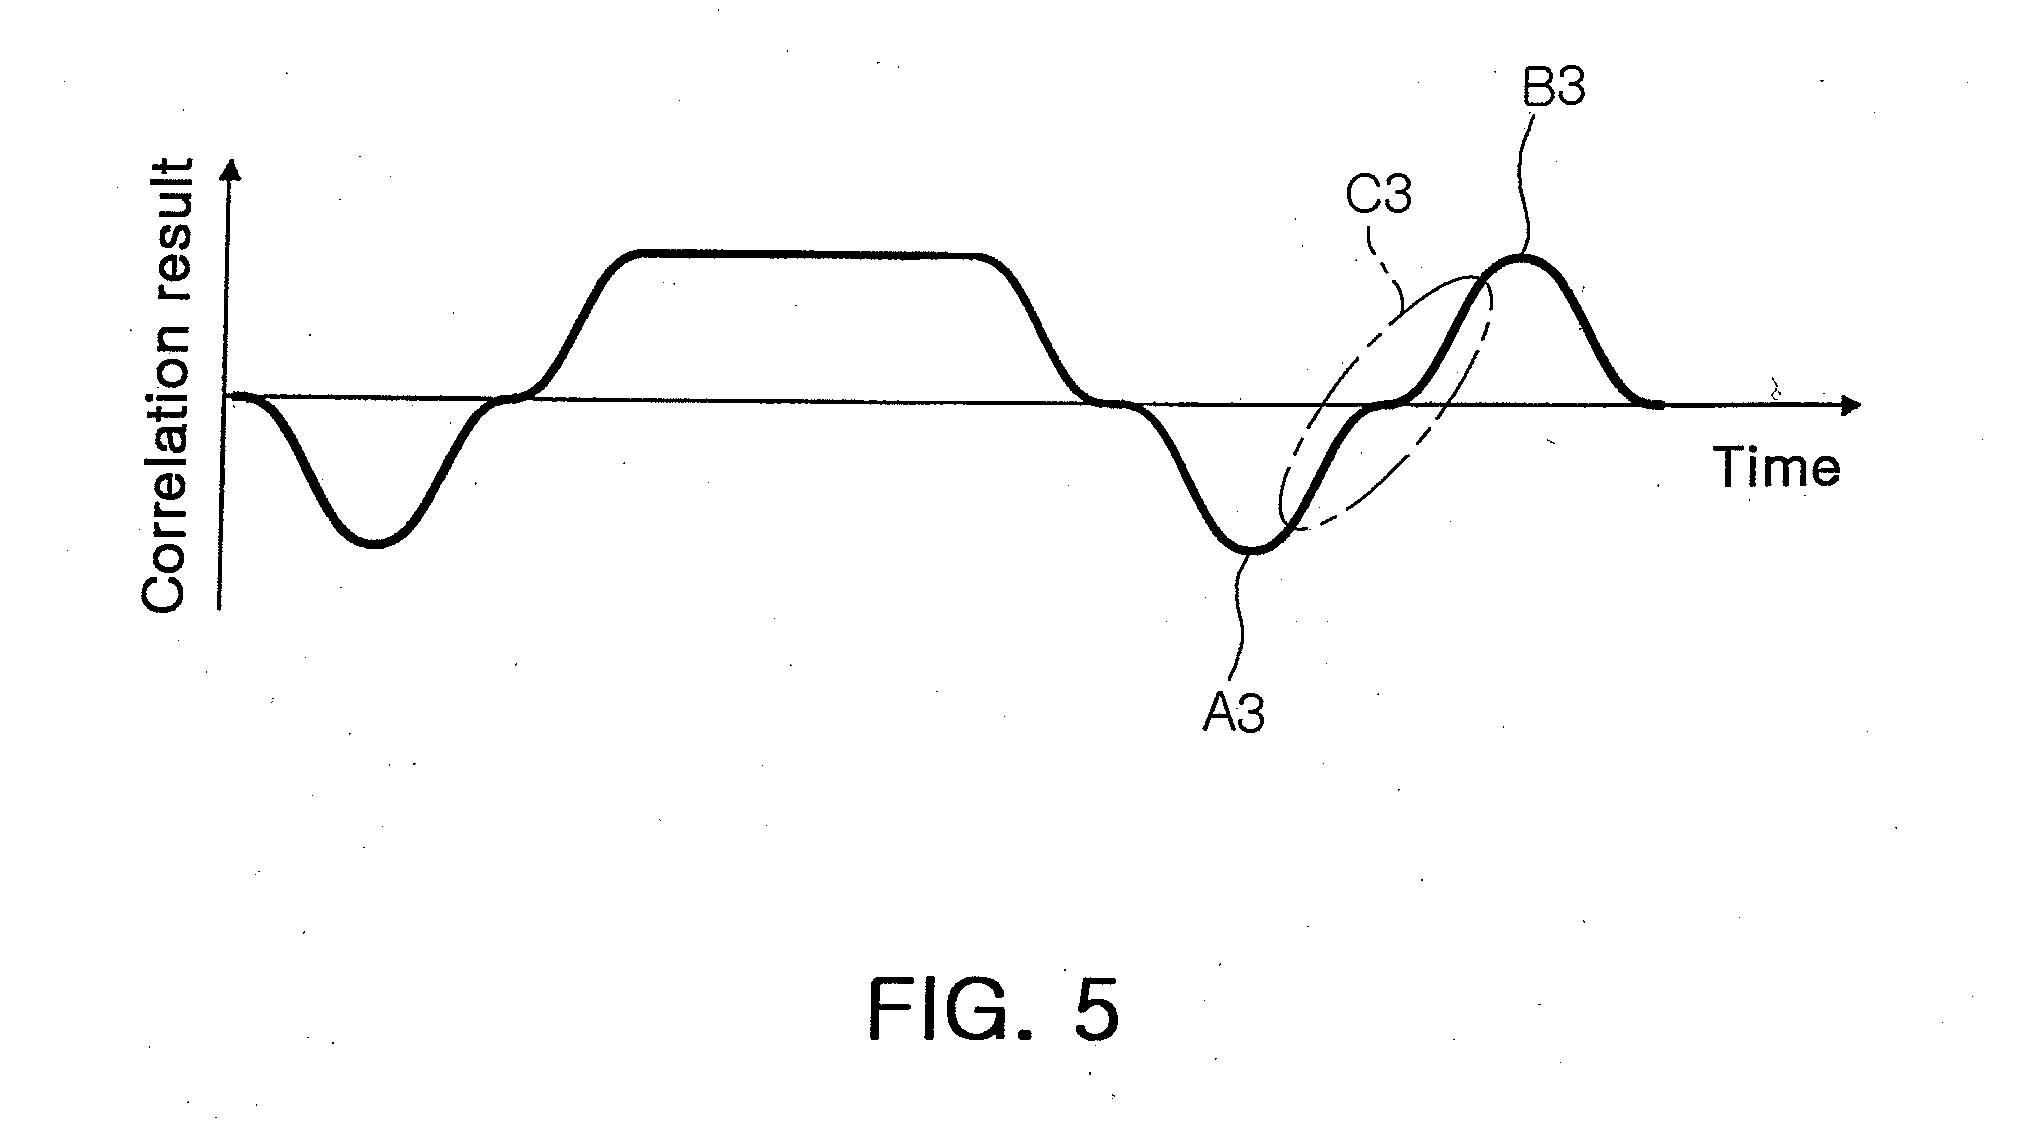 patente us20070230701